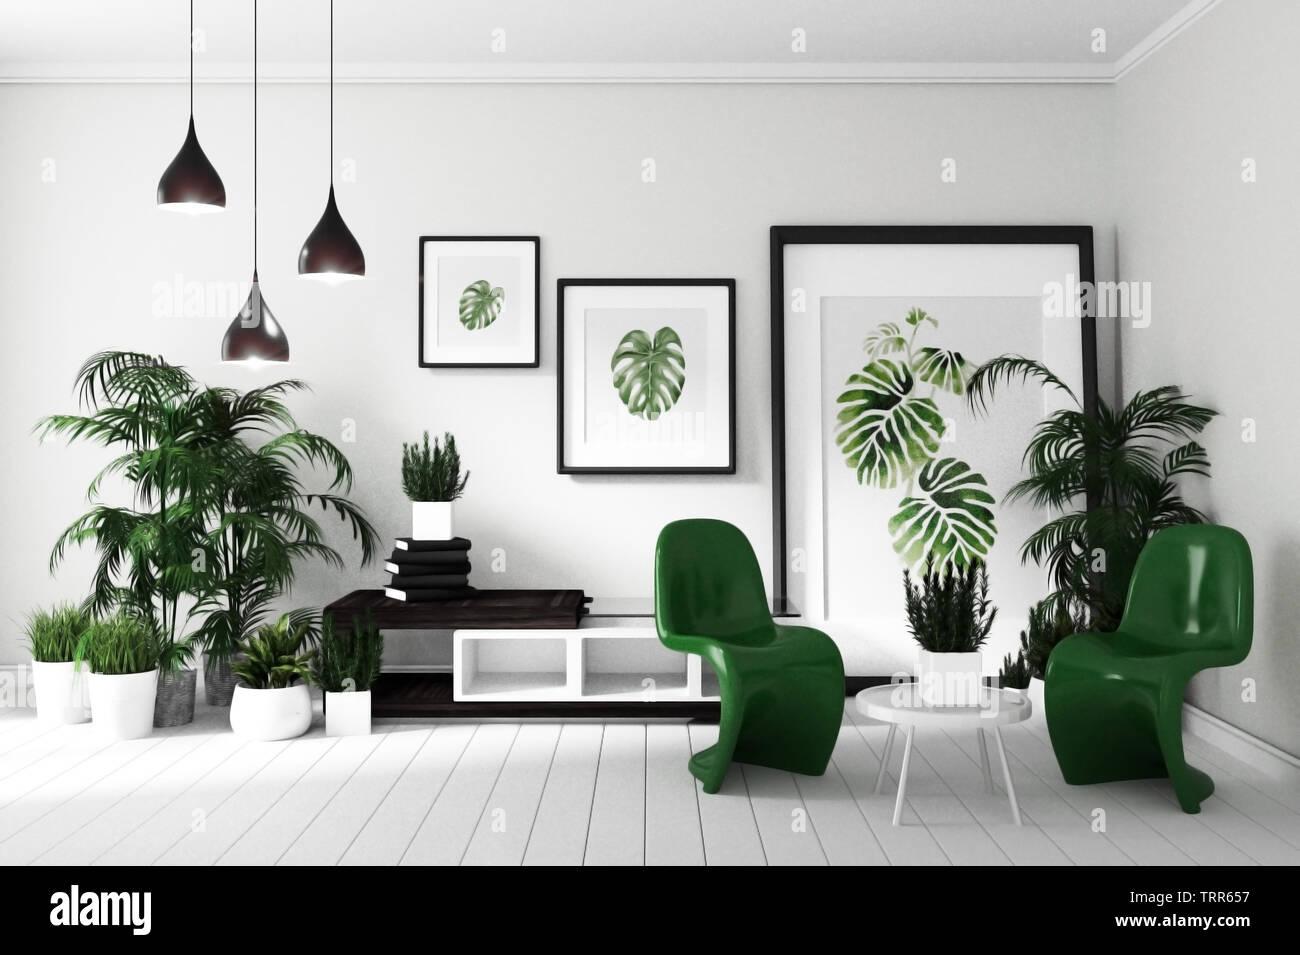 tropical modern living room interior. 9D rendering Stock Photo - Alamy